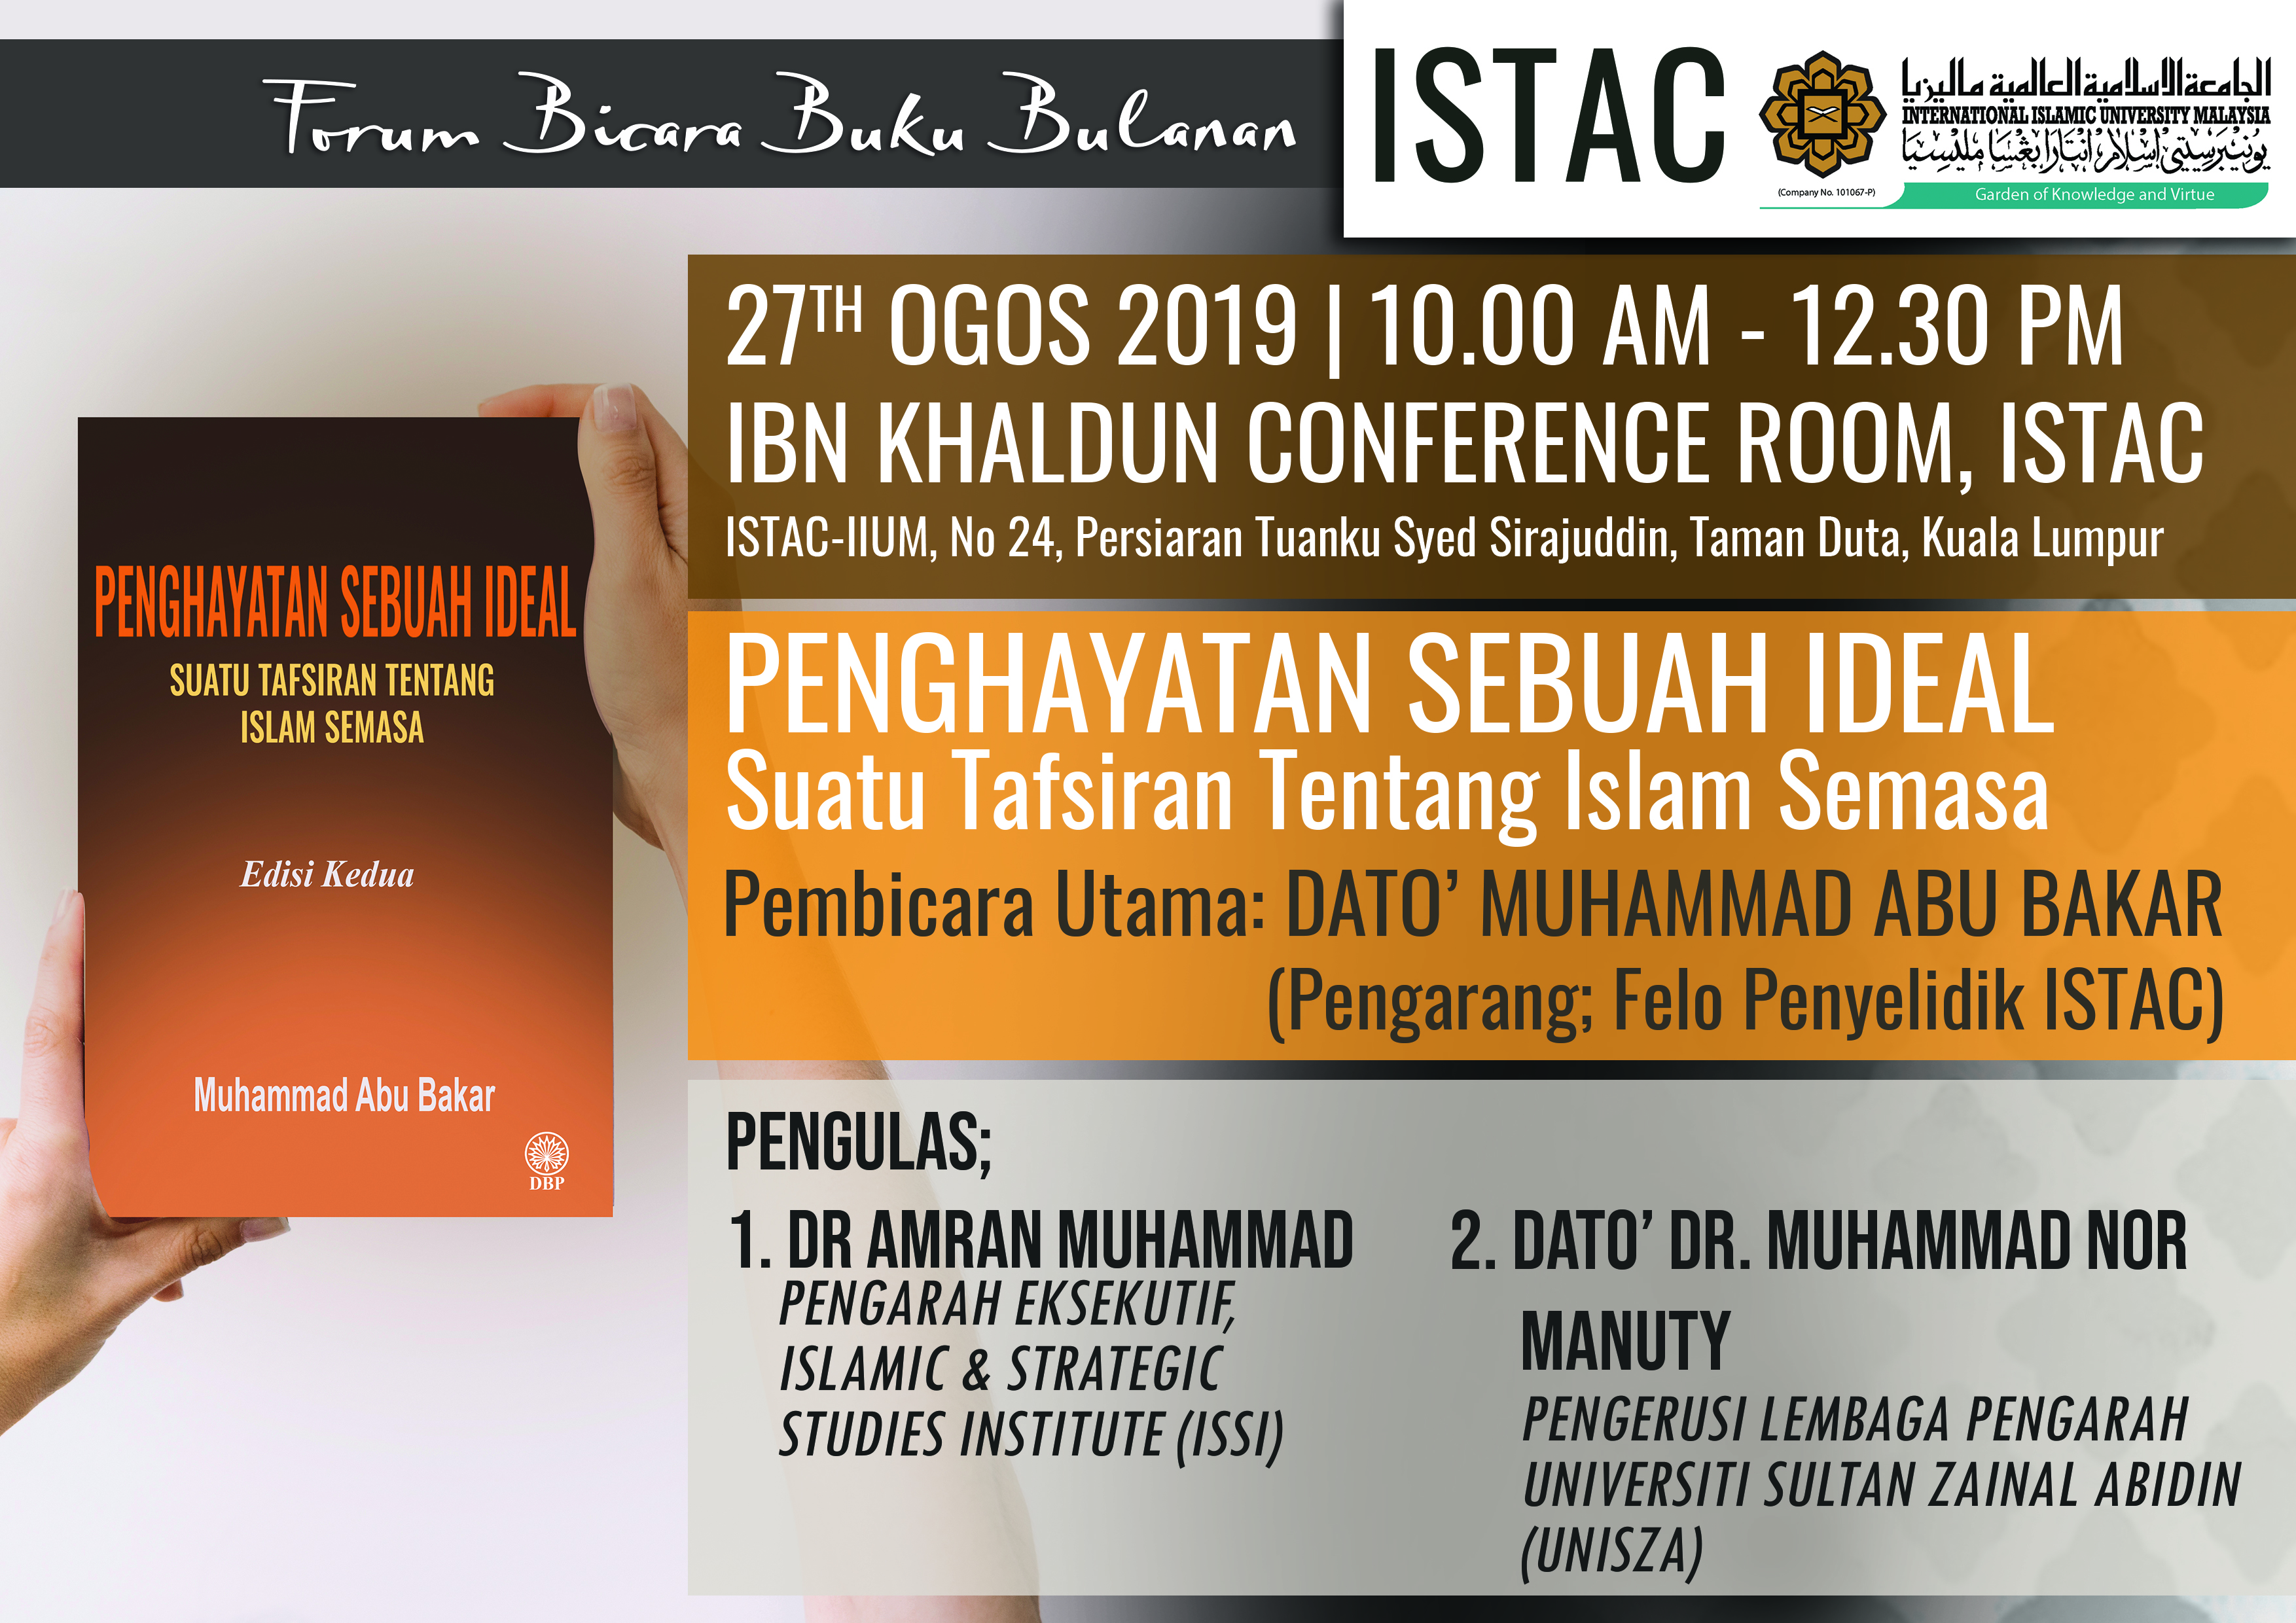 FORUM BICARA BUKU BULANAN :PENGHAYATAN SEBUAH IDEAL  Suatu Taksiran Tentang Islam Semasa